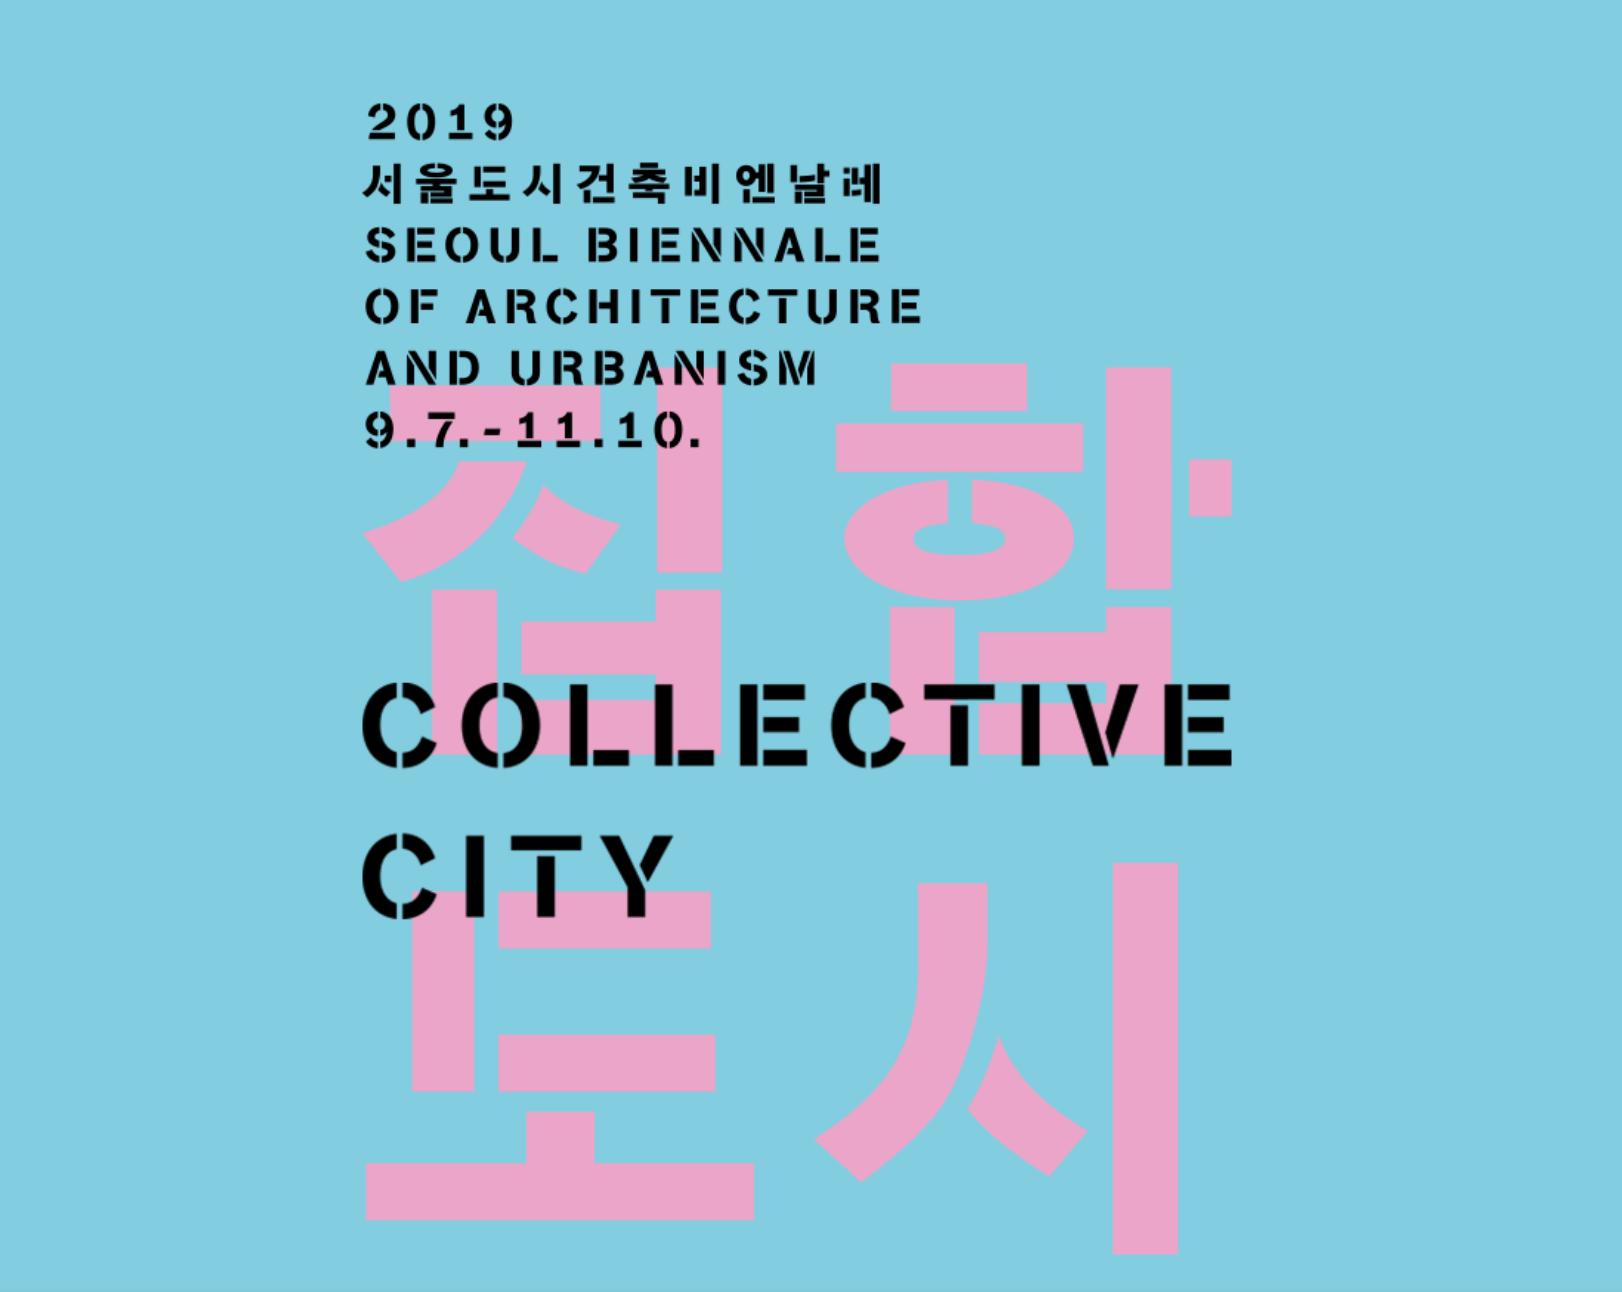 Seoul Biennale copy.png